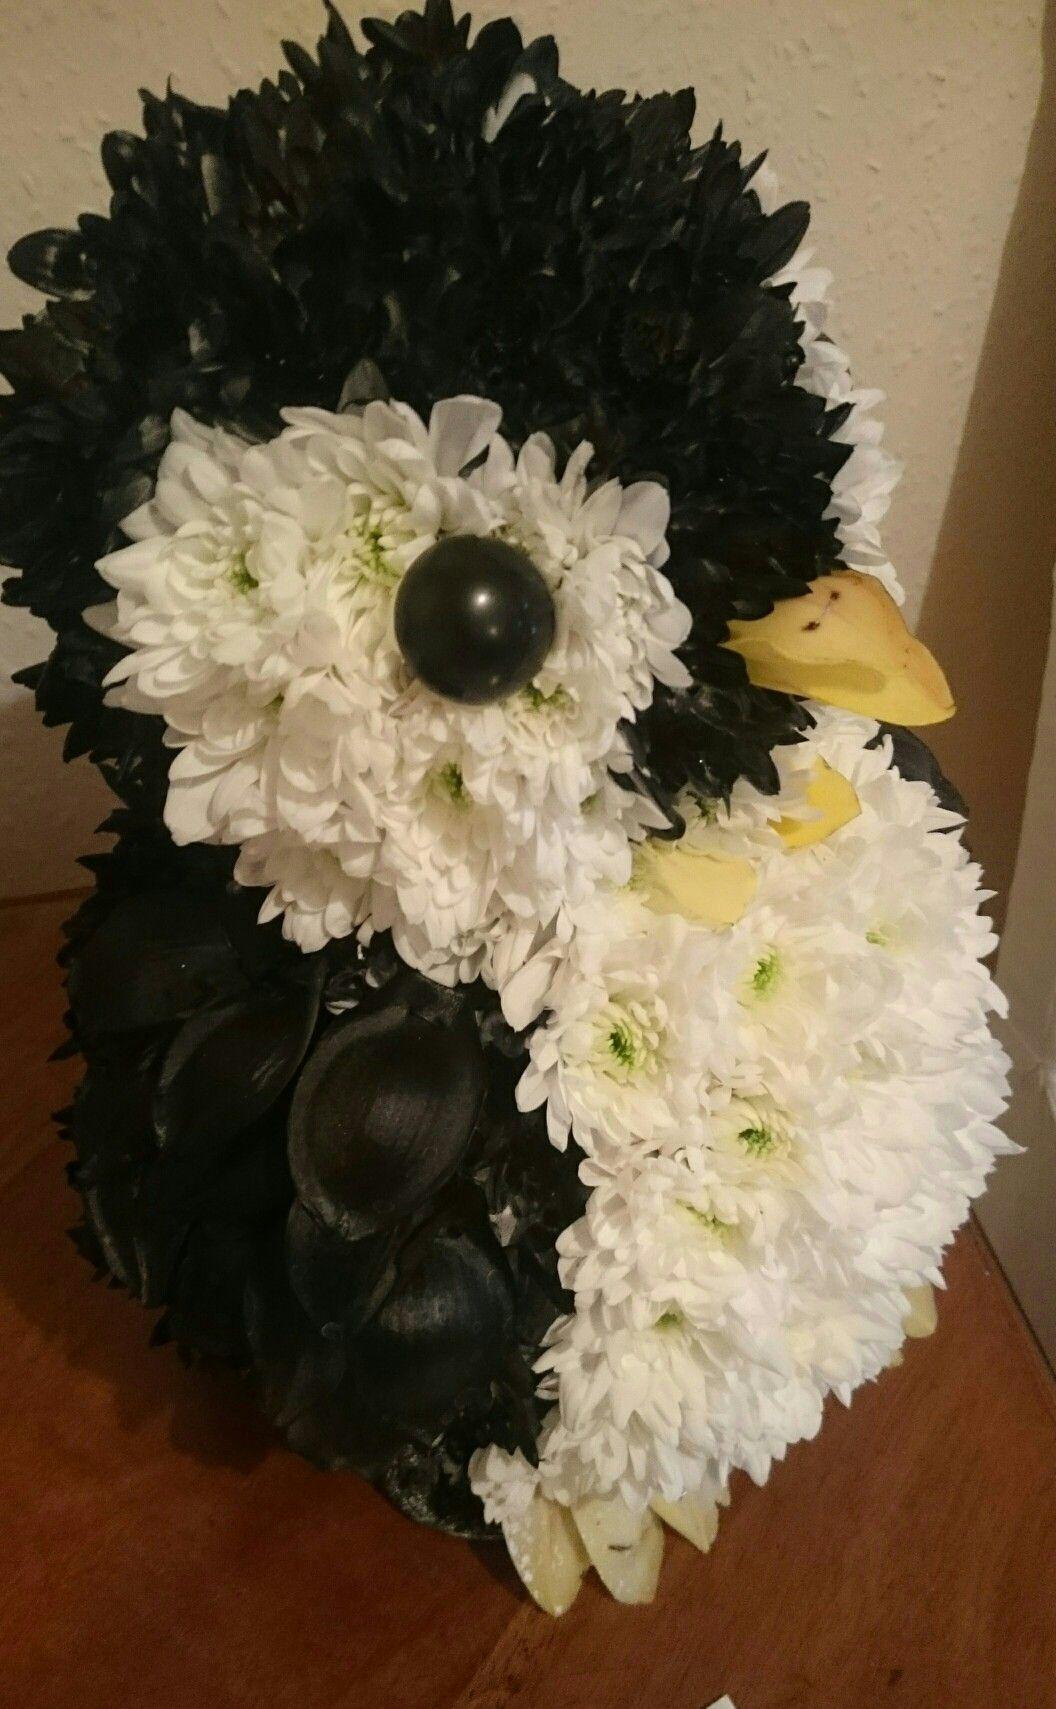 Penguin Funeral Flowers Pinterest Funeral Flowers